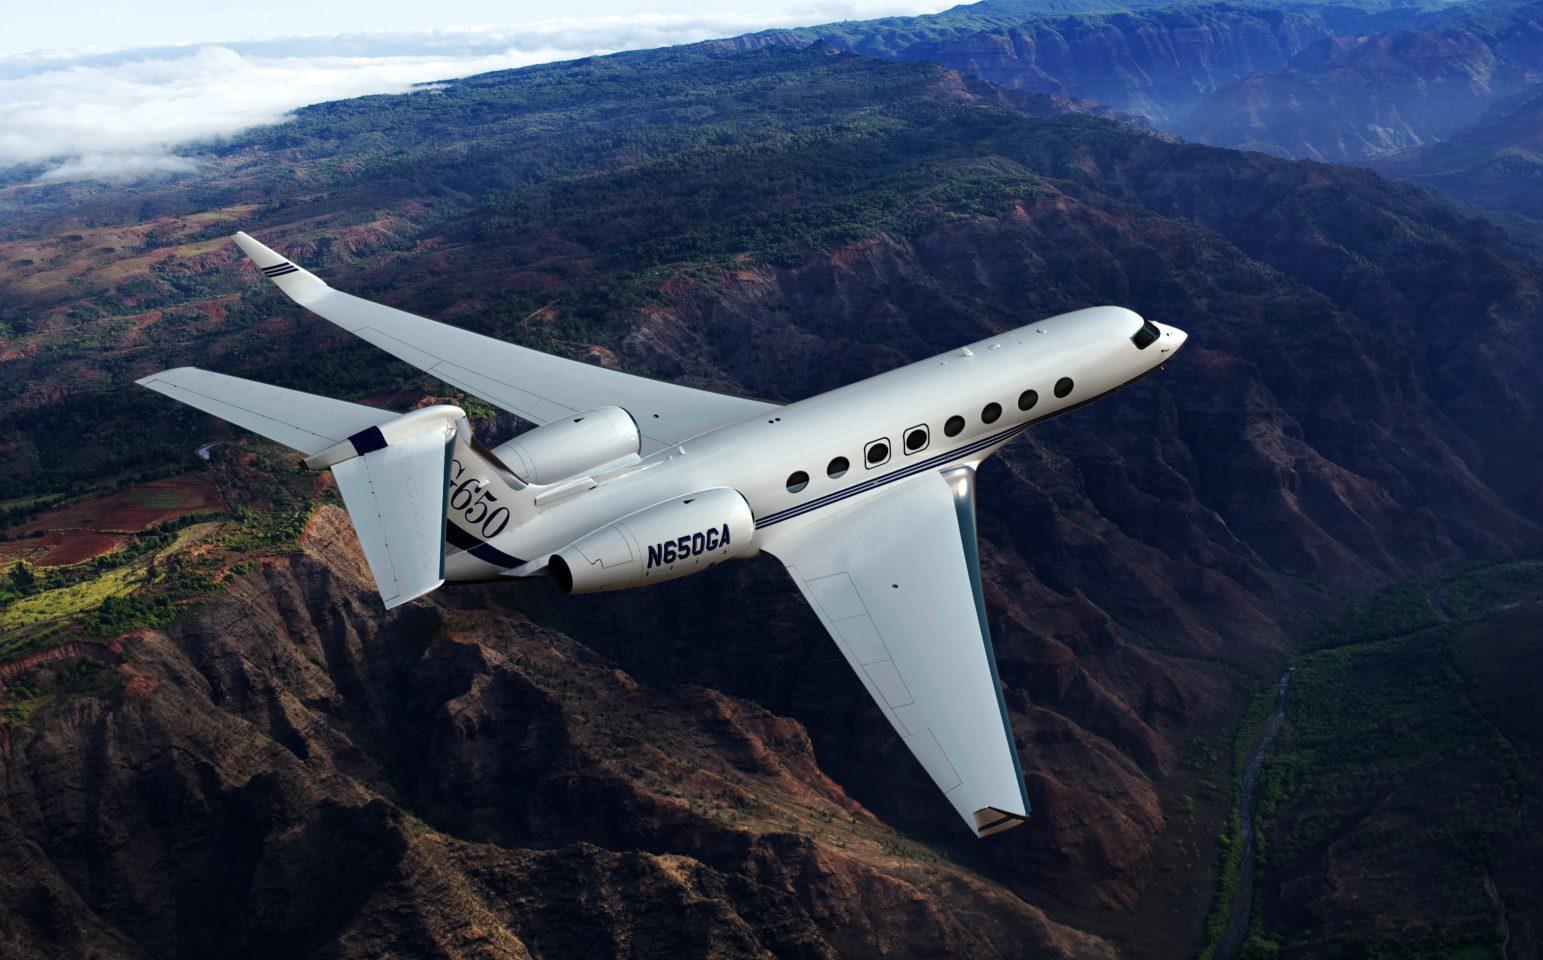 embraer_legacy650 Έχω και πρωθυπουργικό αεροπλάνο, πάμε μια βόλτα; - Οι αμαρτωλές ιστορίες στον αέρα